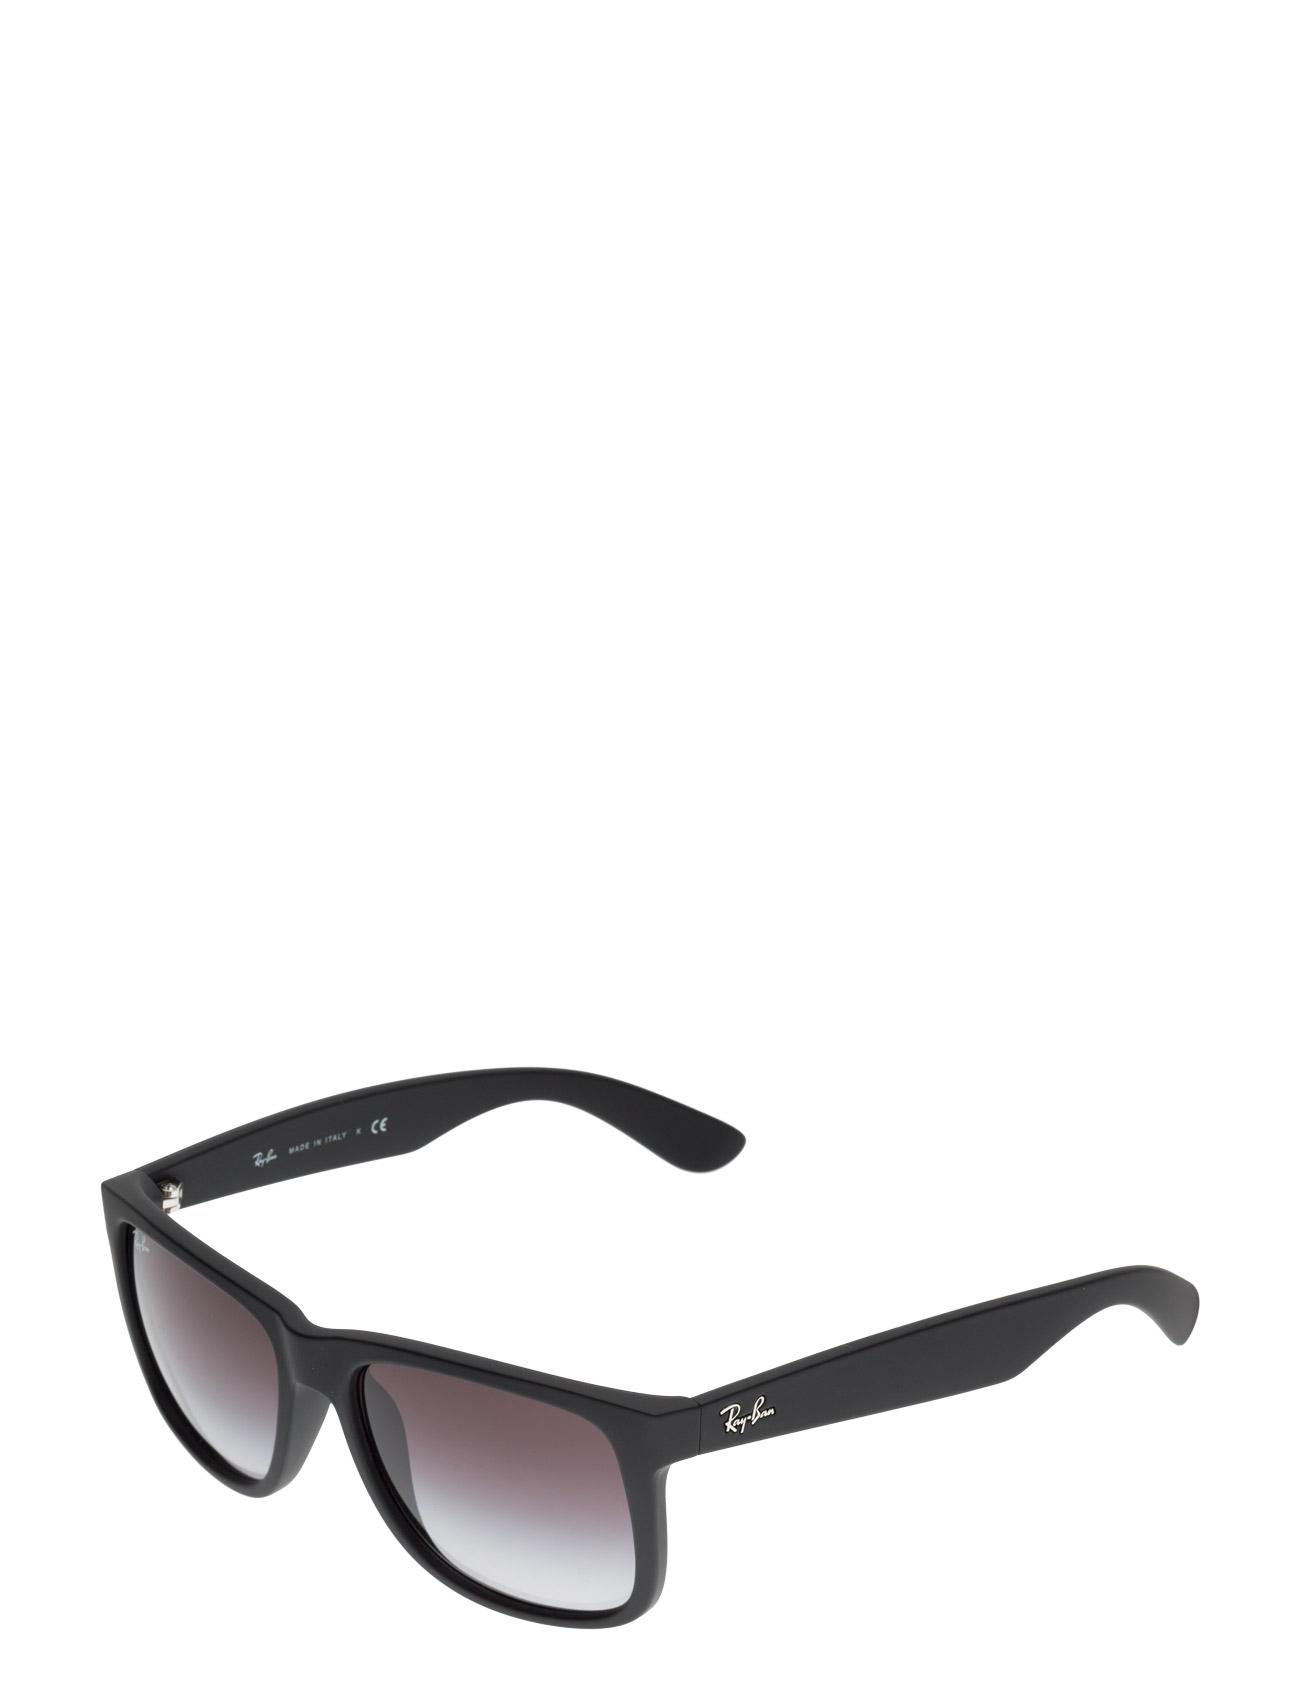 cfbe35fa1bc0 RUBBER BLACK Ray-Ban Justin wayfarer solbriller for herre - Pashion.dk